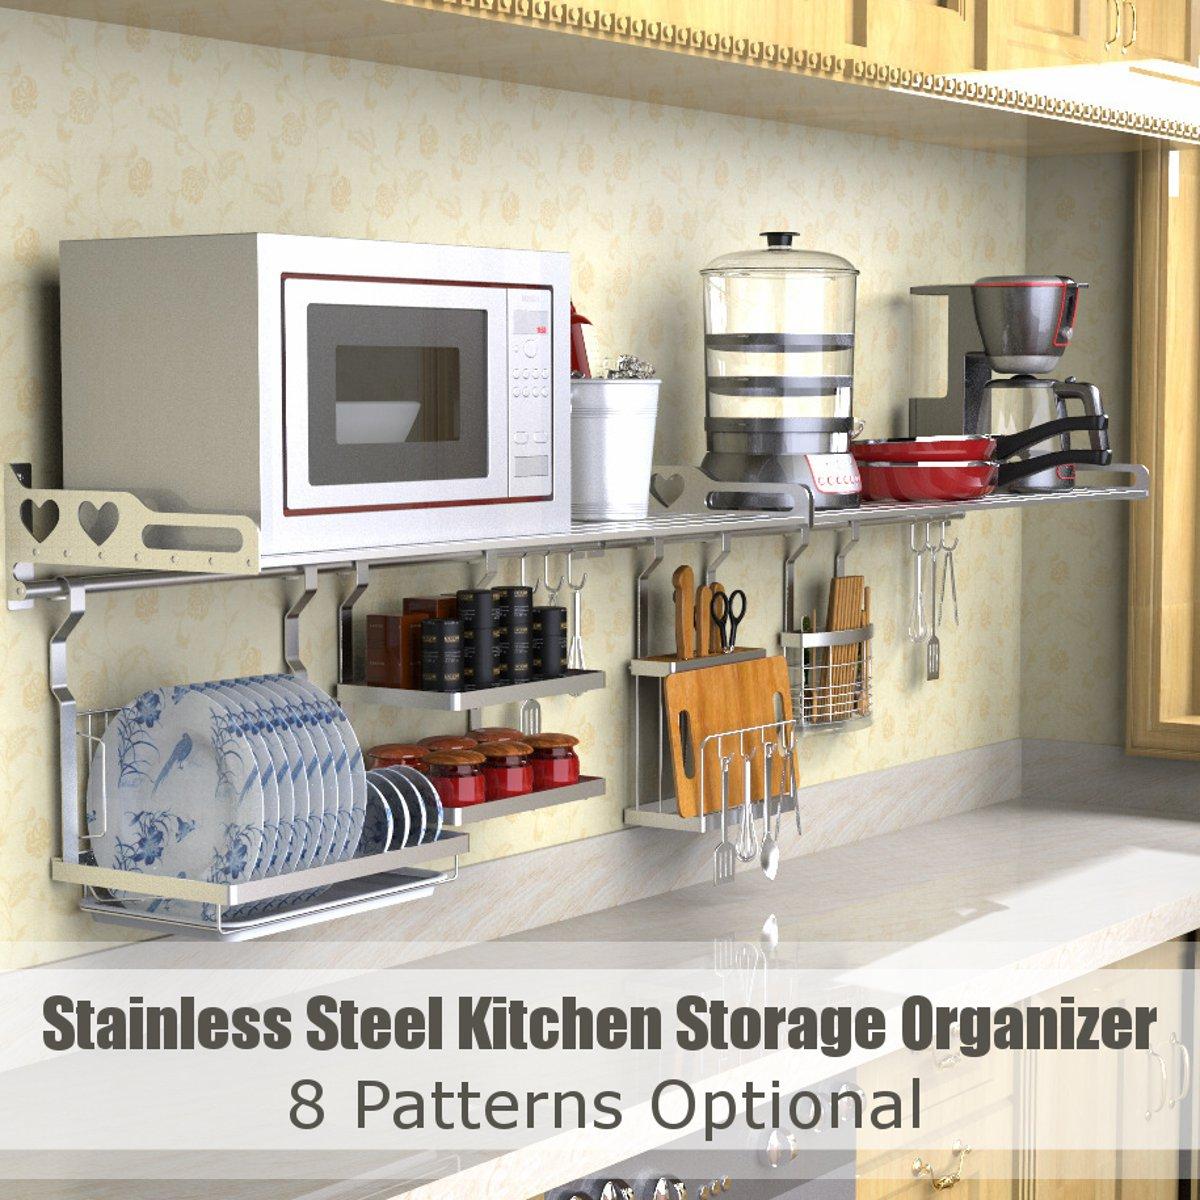 8 Types Stainless Steel Kitchen Organizer Multifunction Dish Drying Rack Wall Hanging Storage Holder Tableware Shelf Drainer